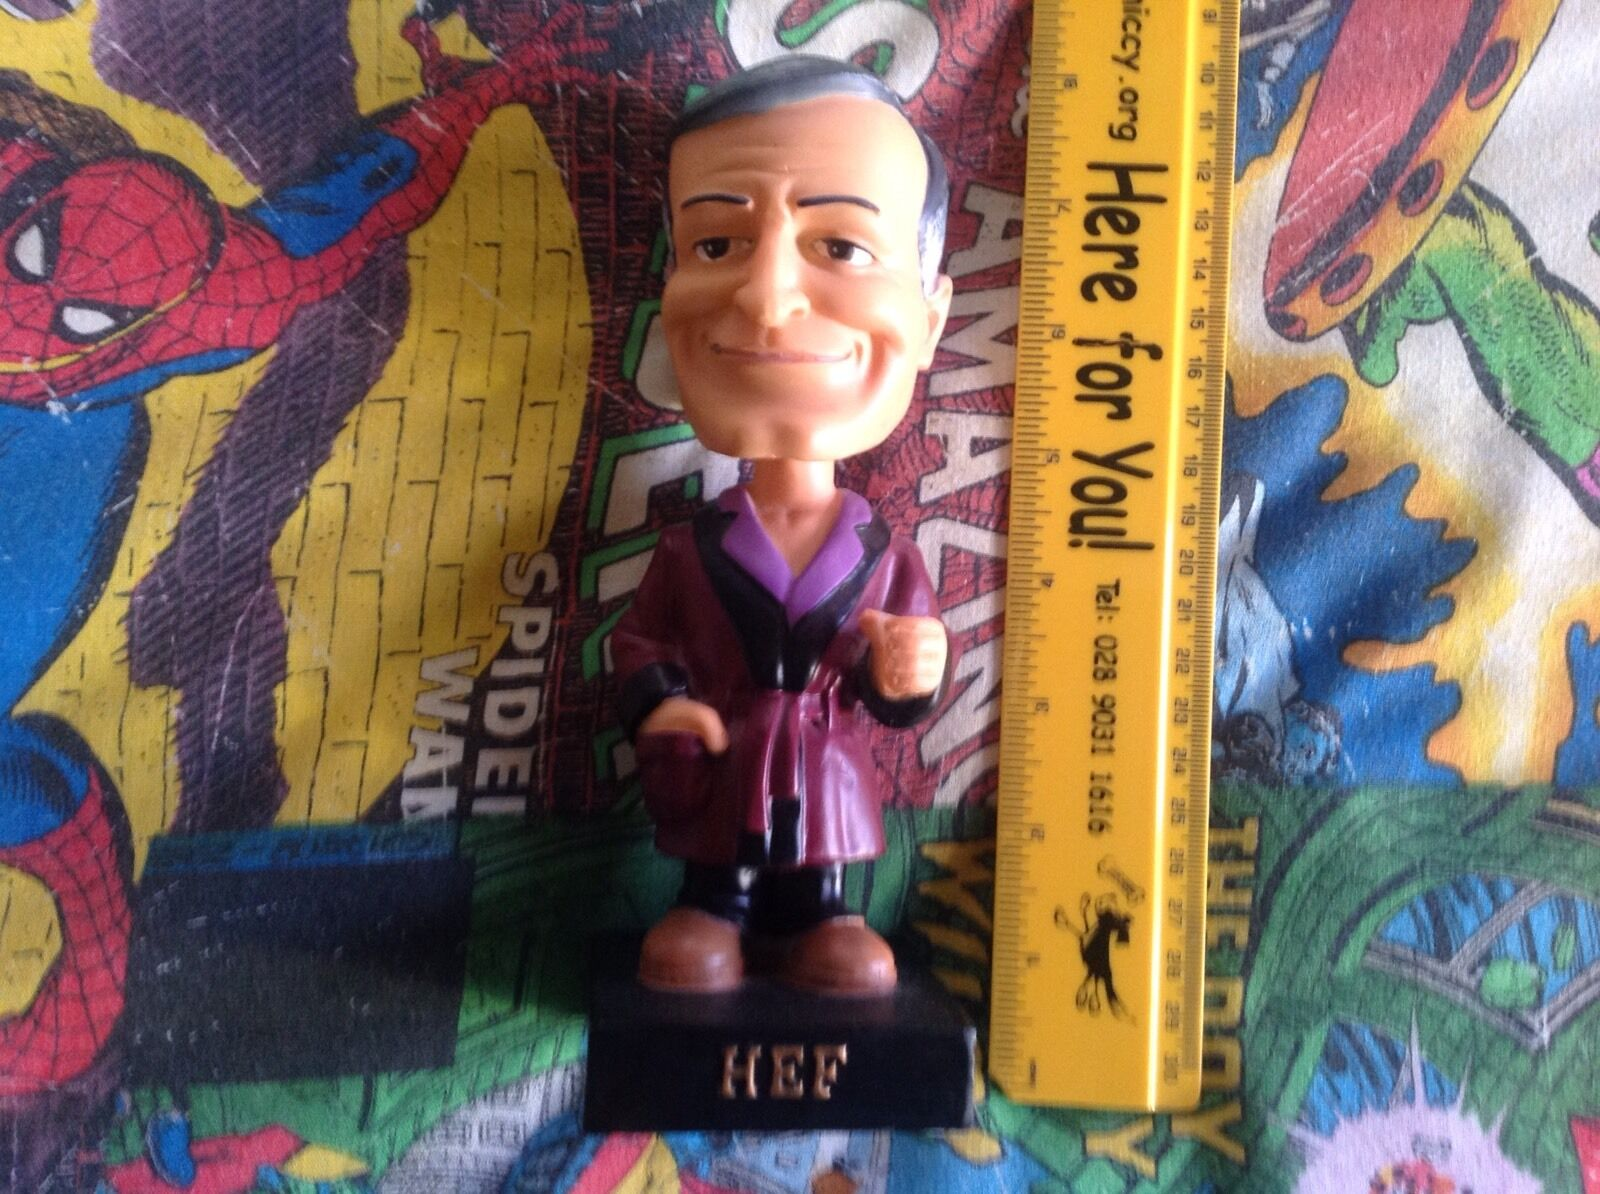 PLAYBOY - HUGH HEFNER - BOBBLE HEAD - 2004  - HEF - Playboy Bunny - Very Rare